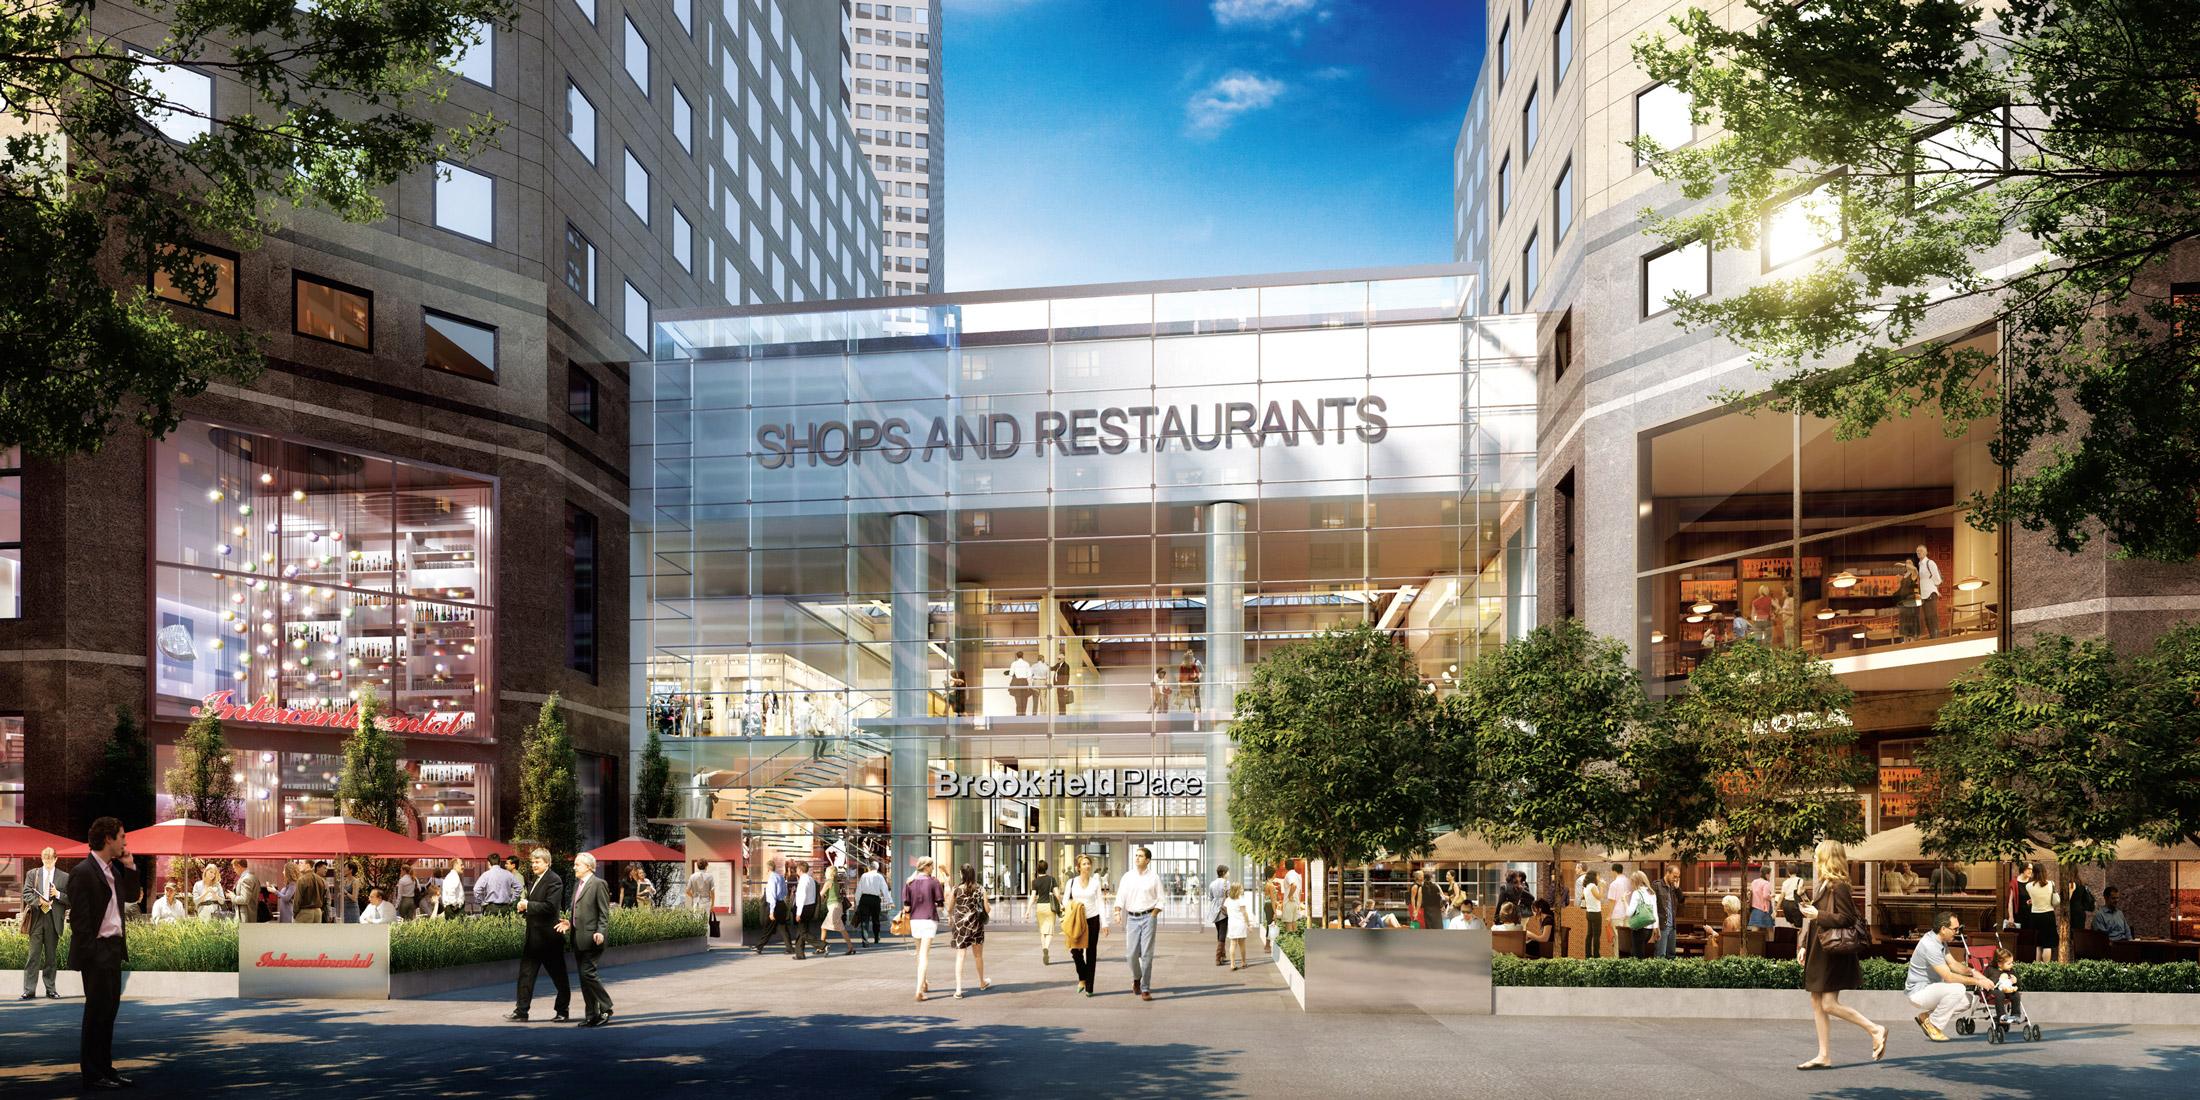 A E Restaurants Retail Or Food Service